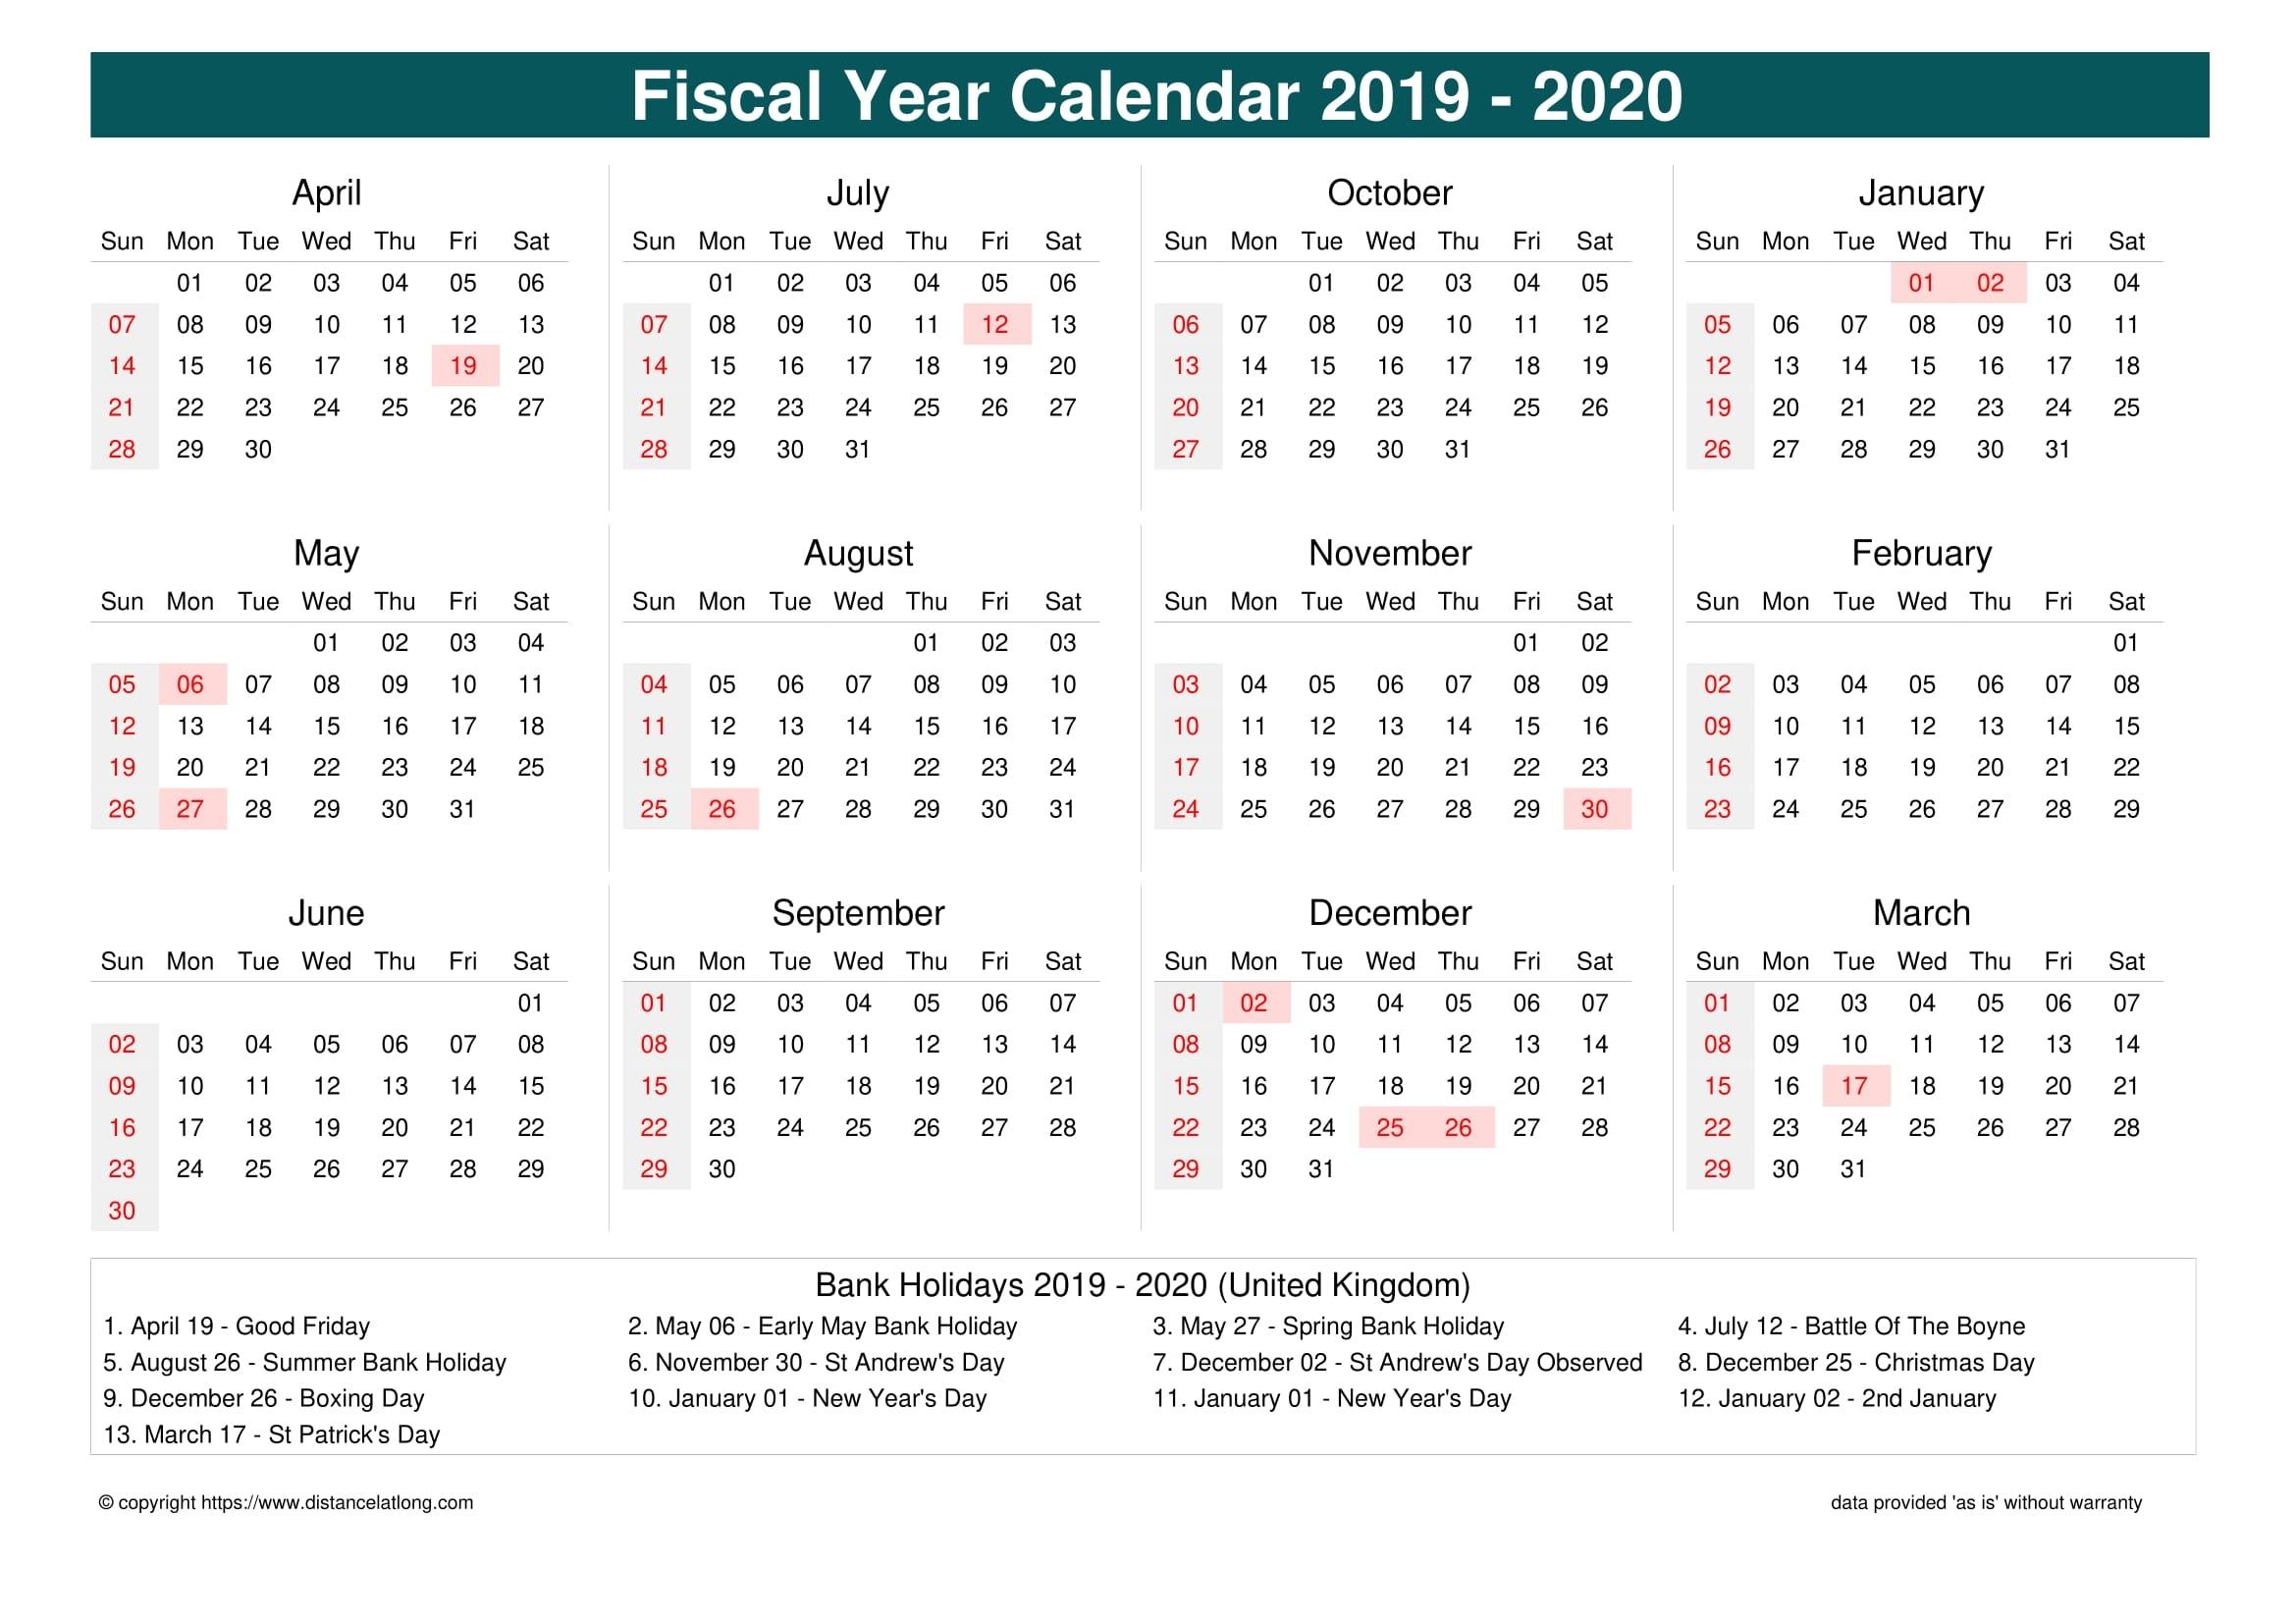 Fiscal Year 2019-2020 Calendar Templates, Free Printable